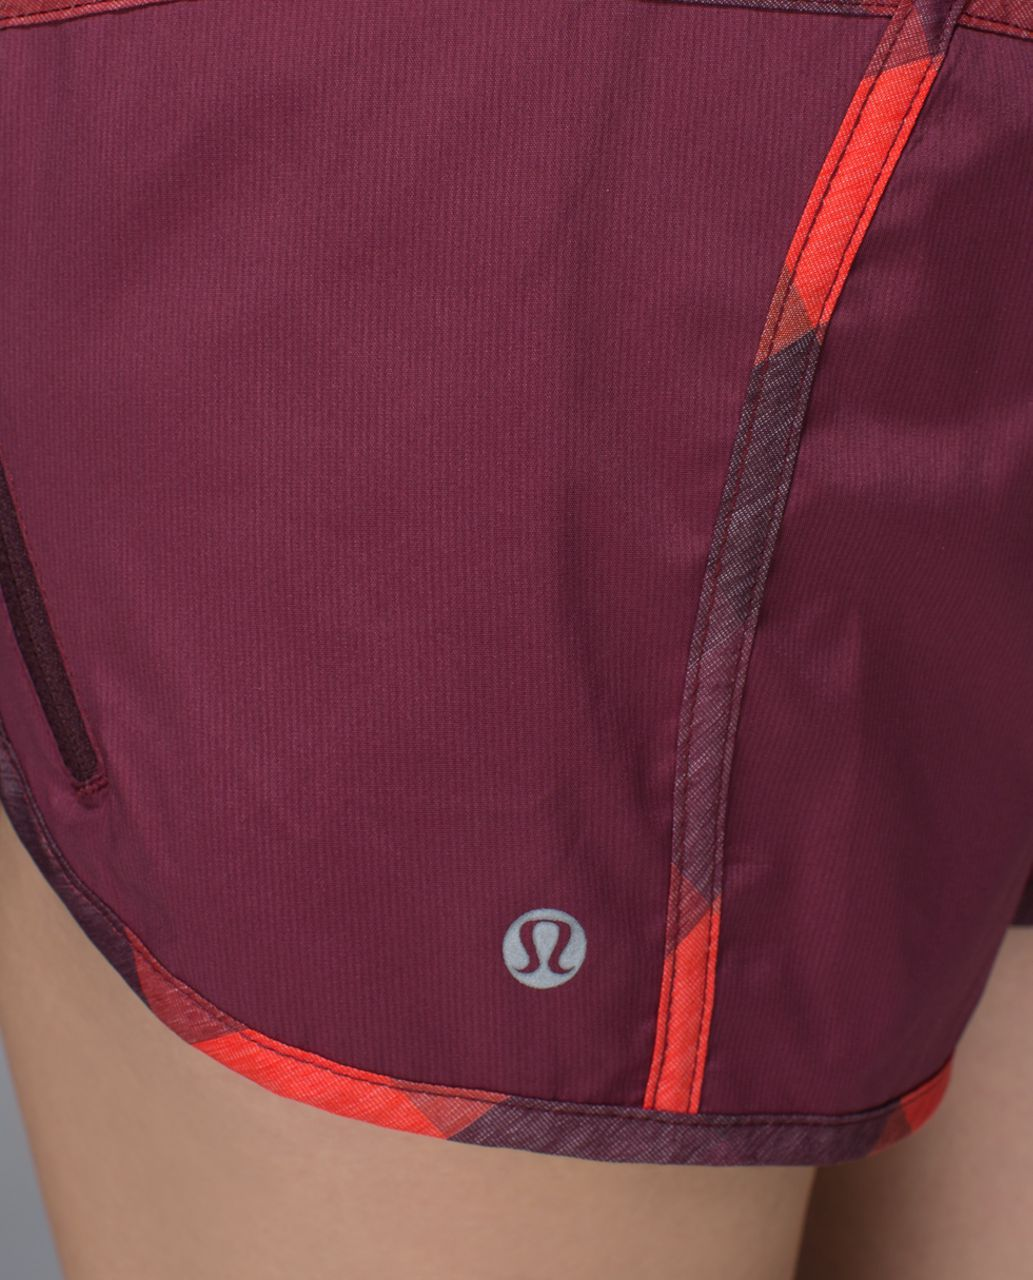 Lululemon Tracker Short II *2-way Stretch - Rust Berry / Yama Check Heathered Flaming Tomato / Rust Berry